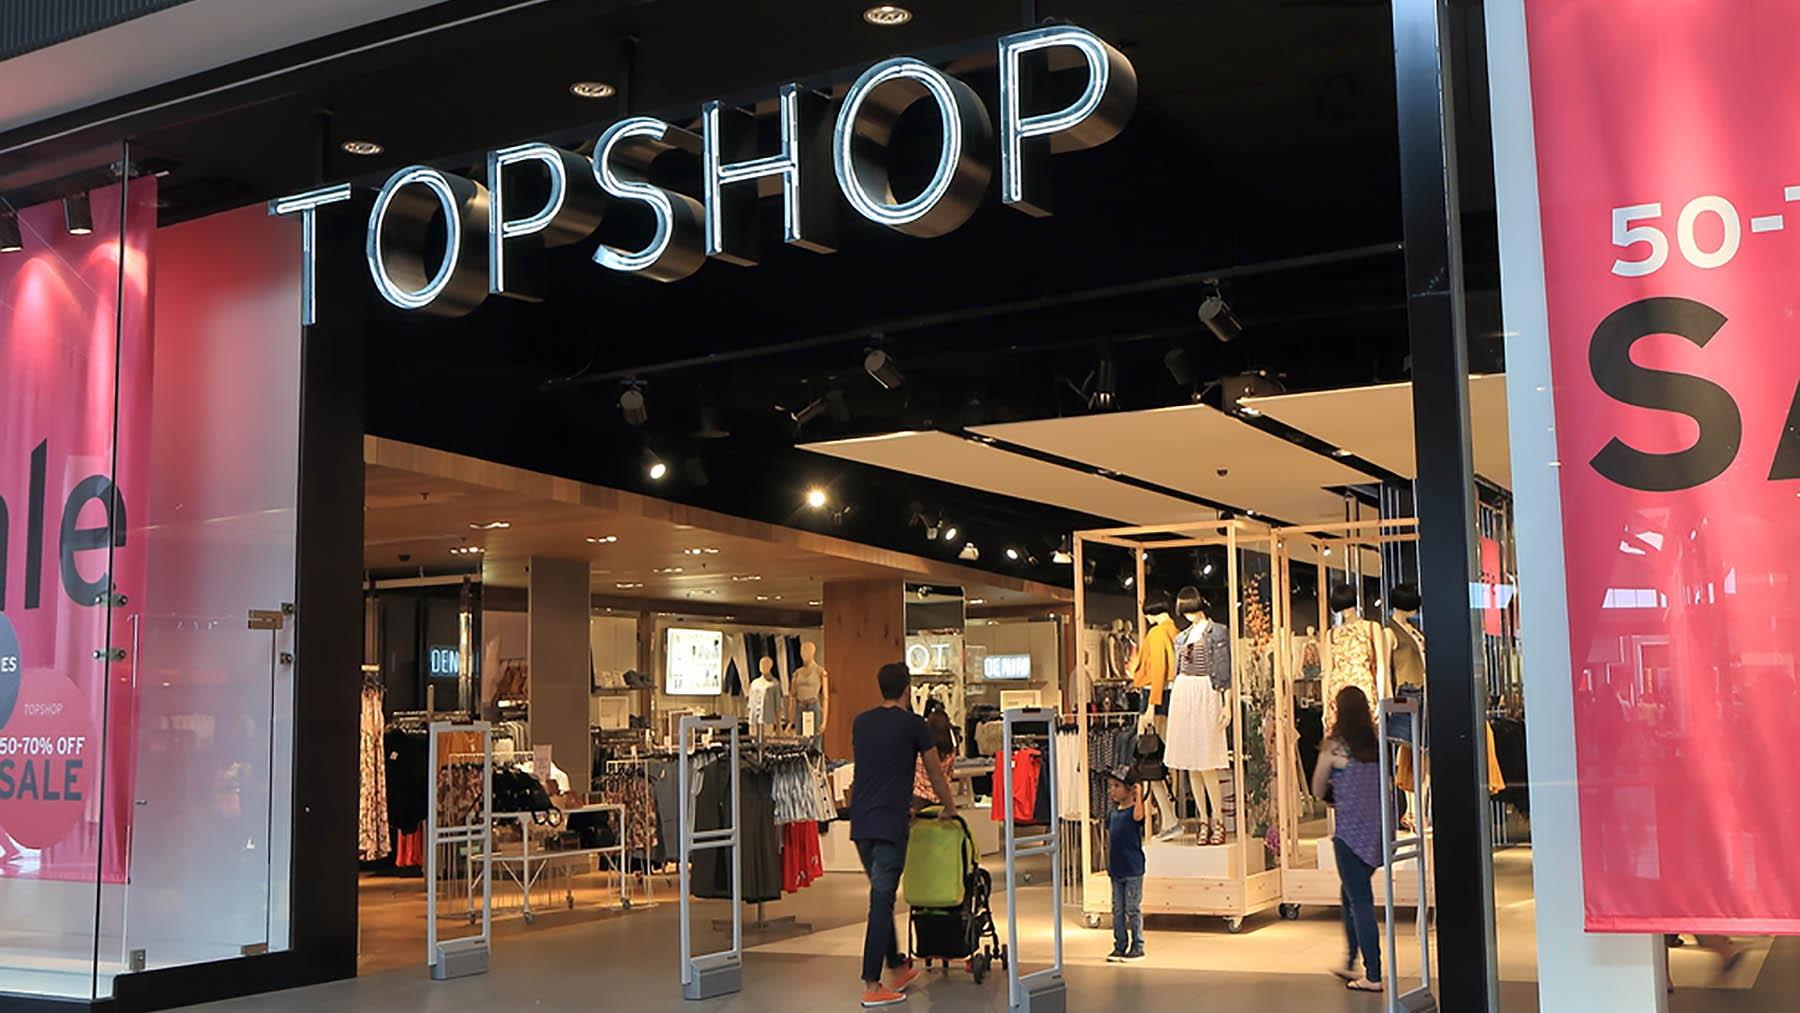 Topshop store in Melbourne, Australia | Source: Shutterstock